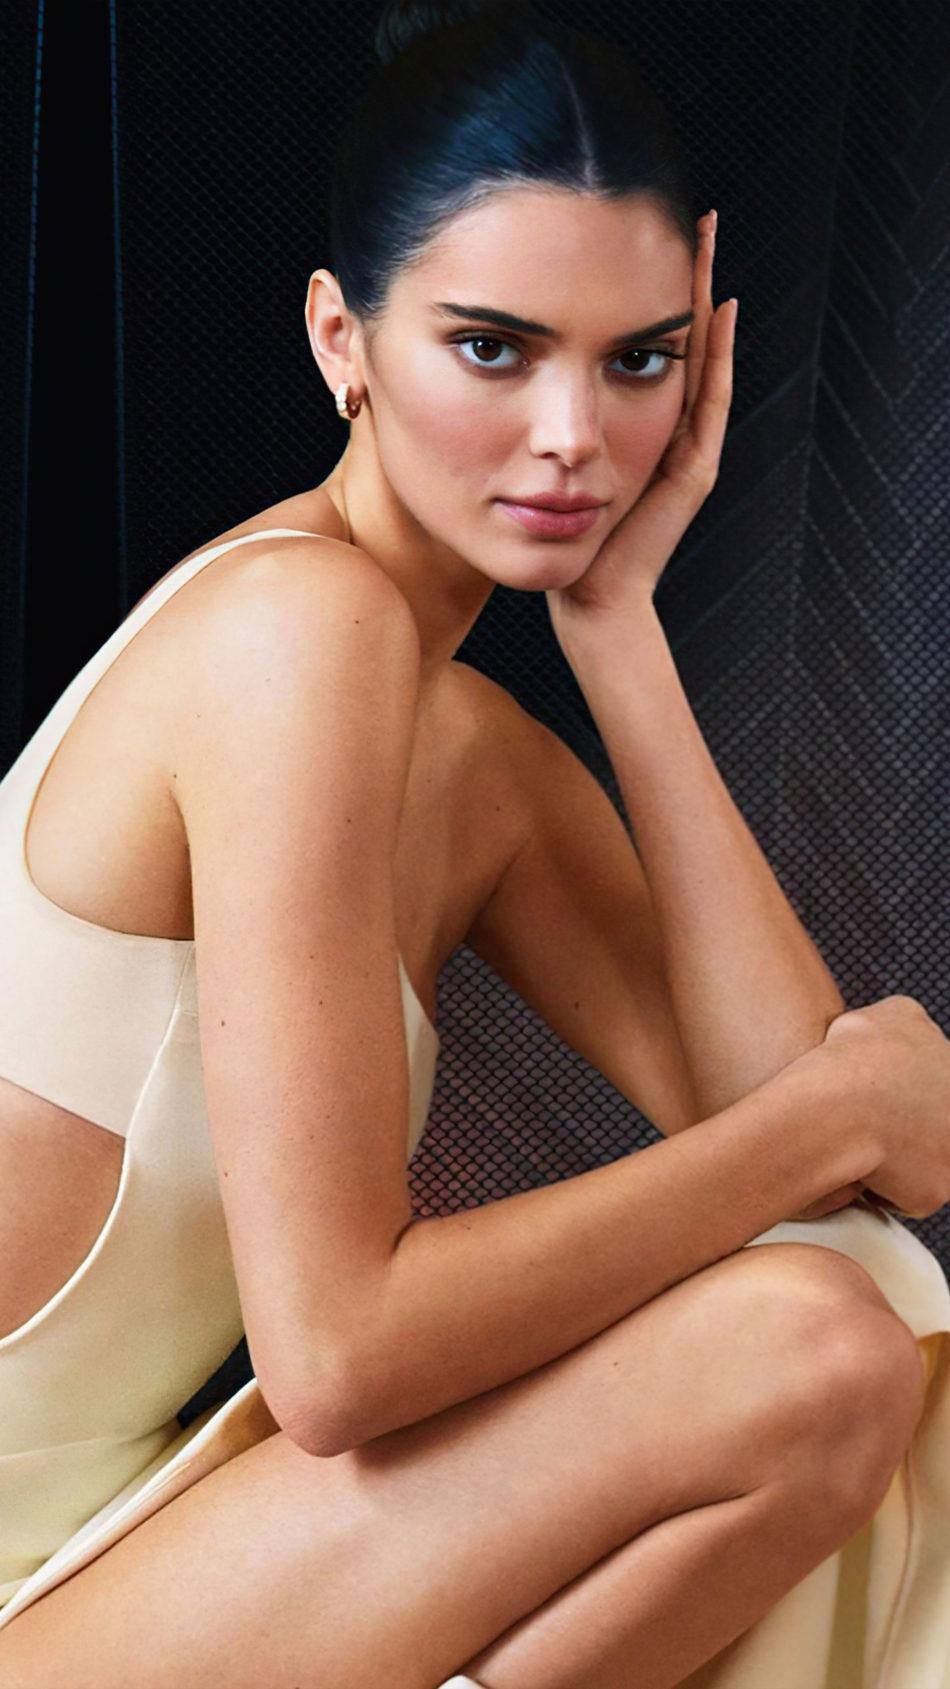 Kendall Jenner Photoshoot New 2021 4K Ultra HD Mobile Wallpaper